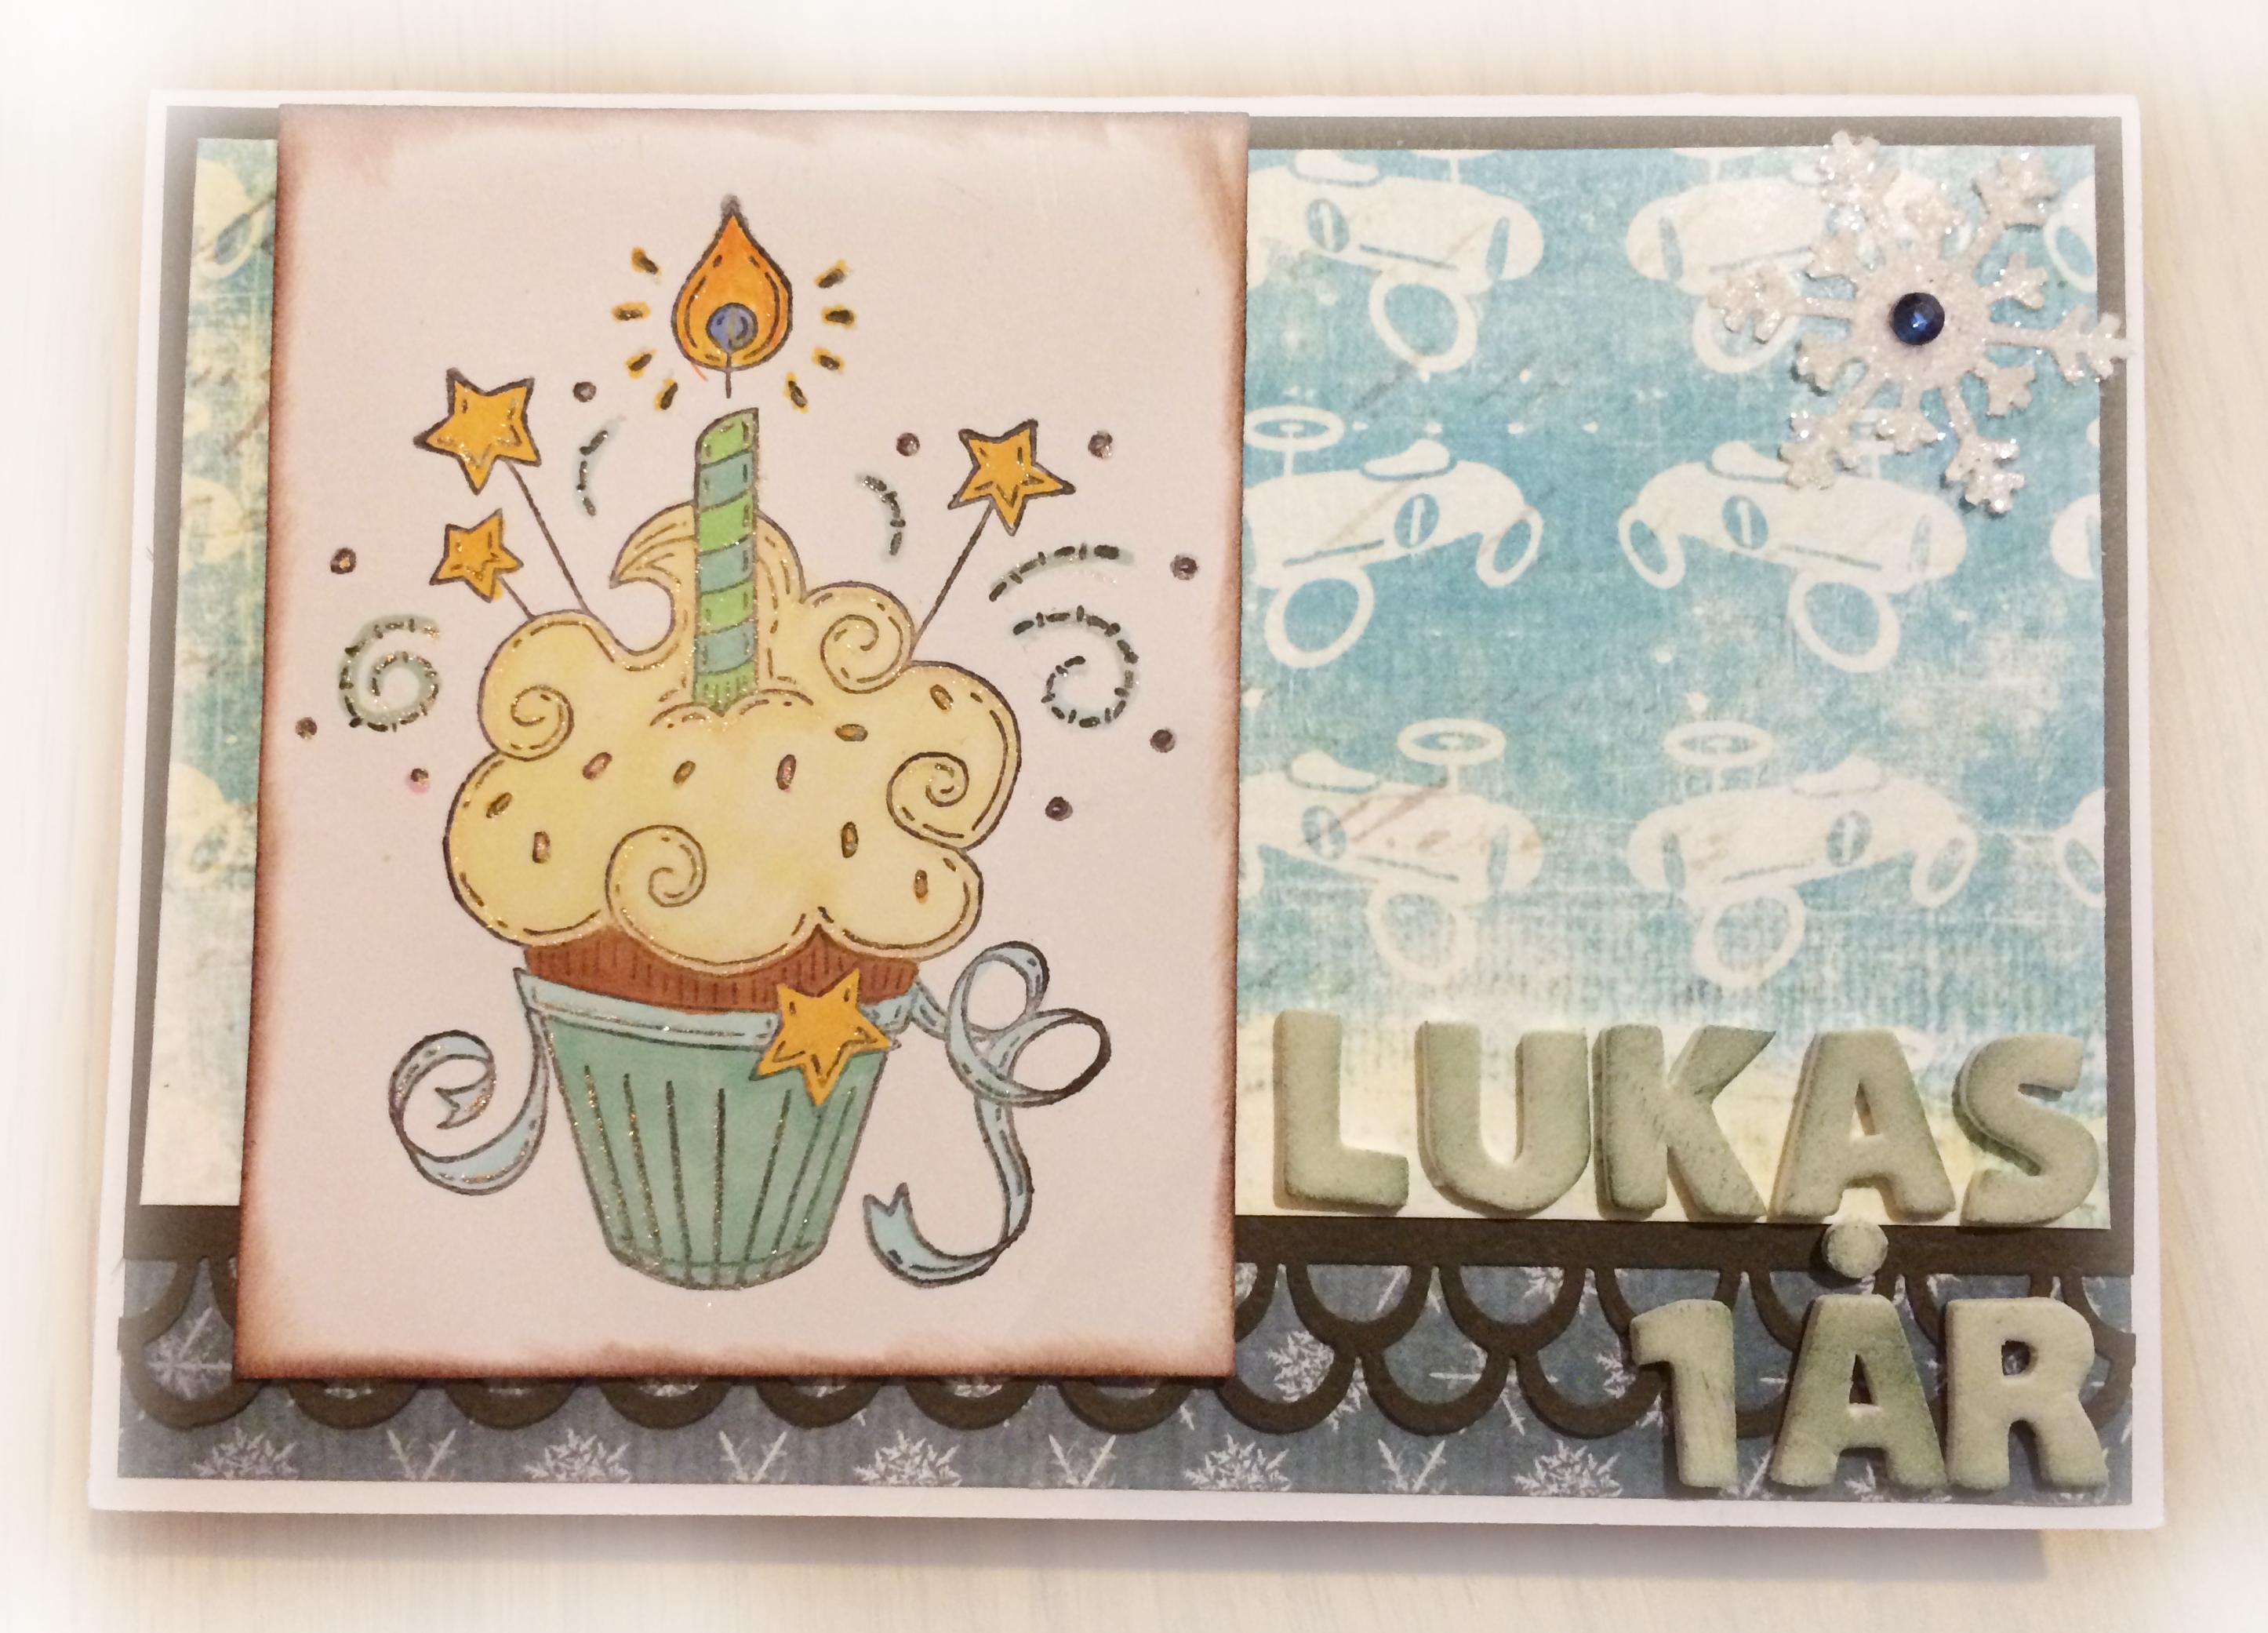 Födelsedagskort, Lukas